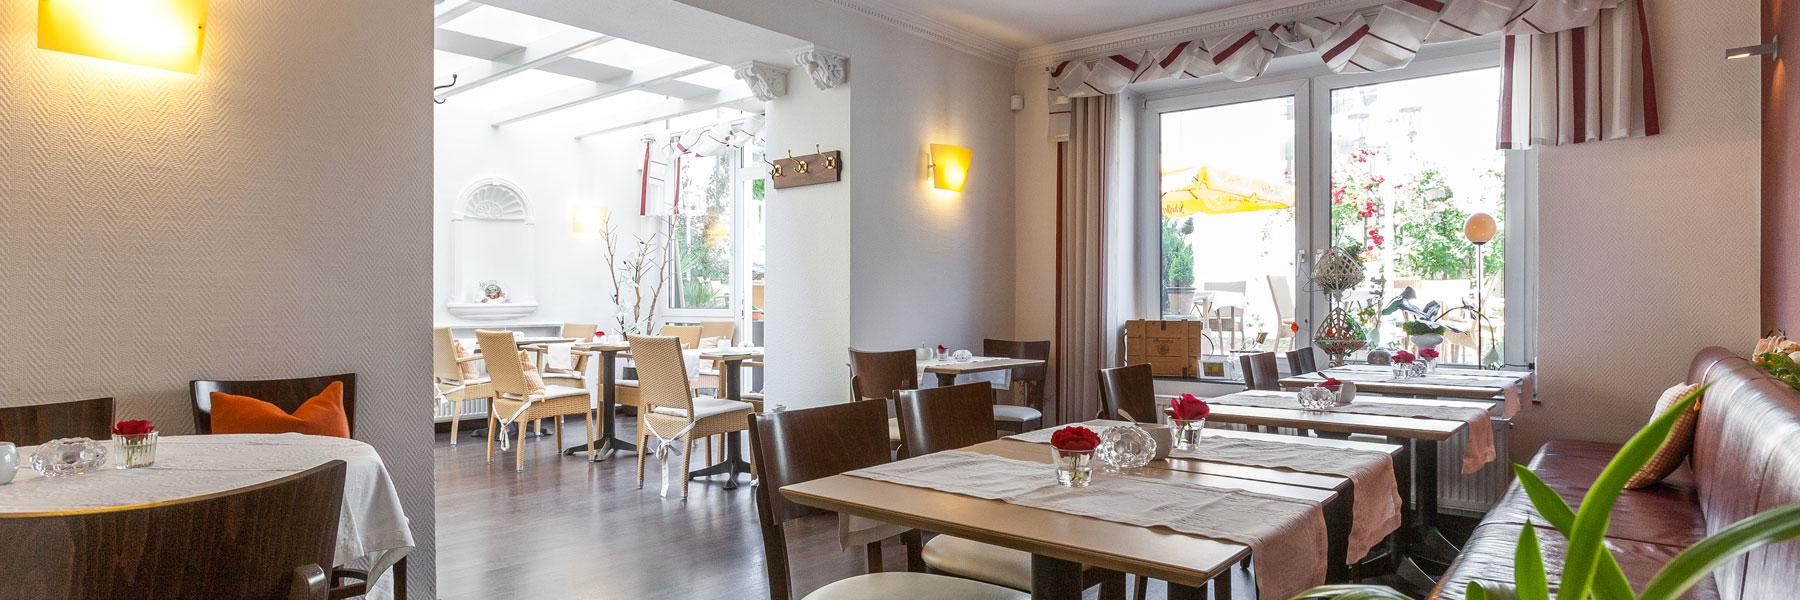 Restaurant - Hotel Villa Auguste Viktoria